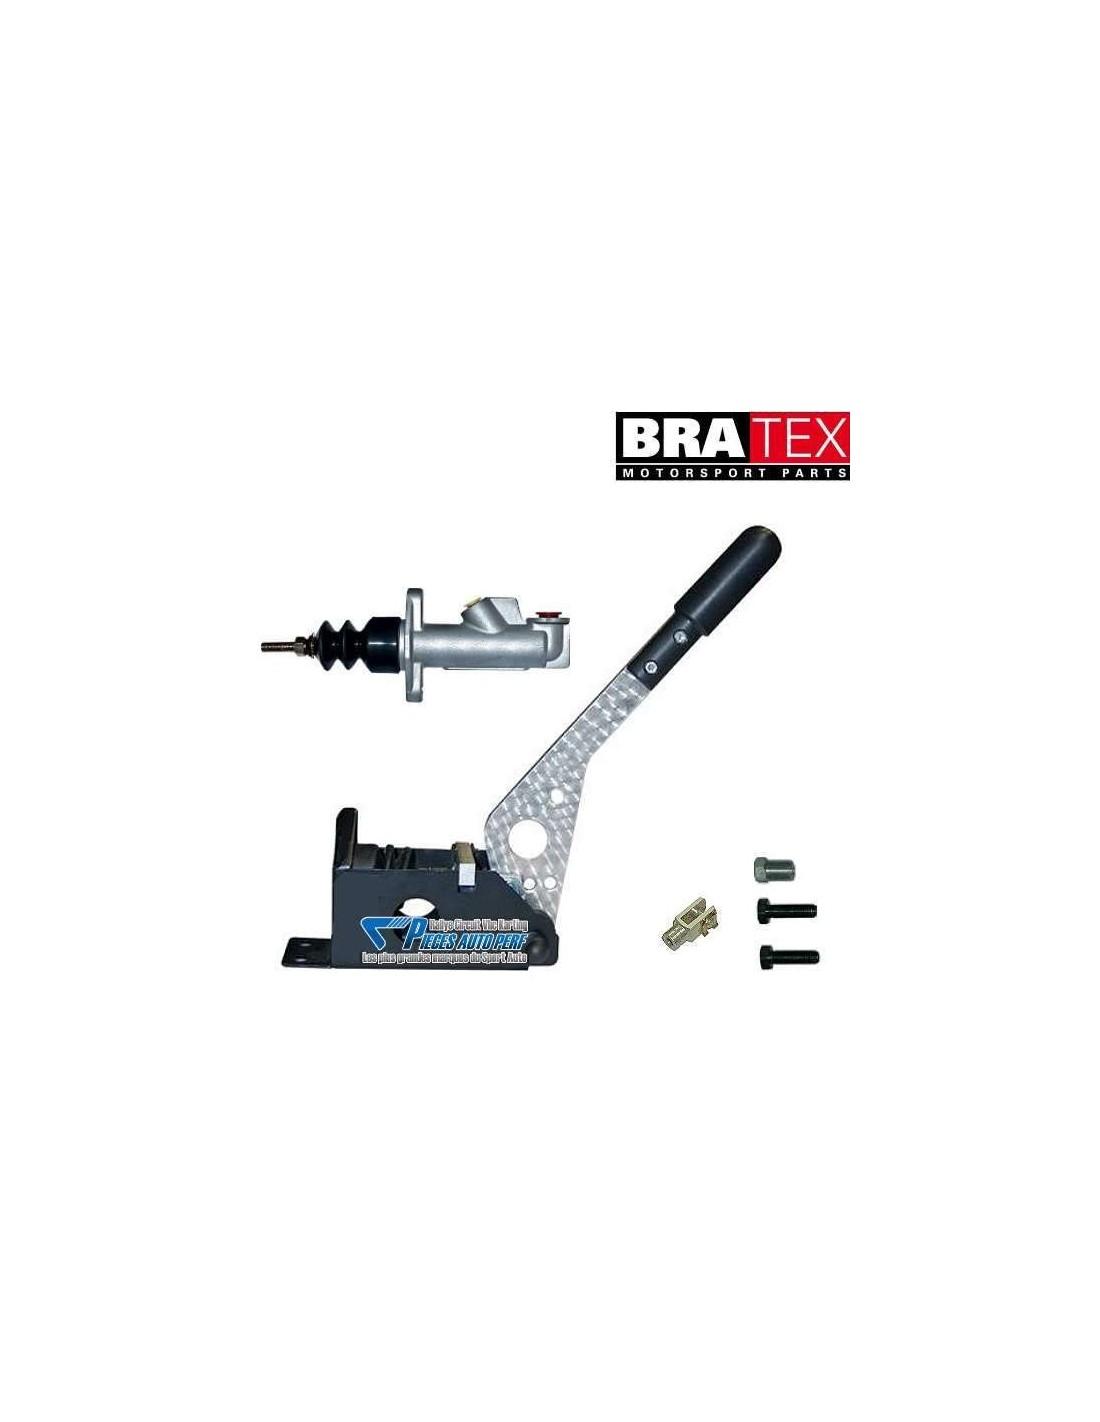 kit frein  u00e0 main hydraulique pro horizontal 45 u00b0 bratex